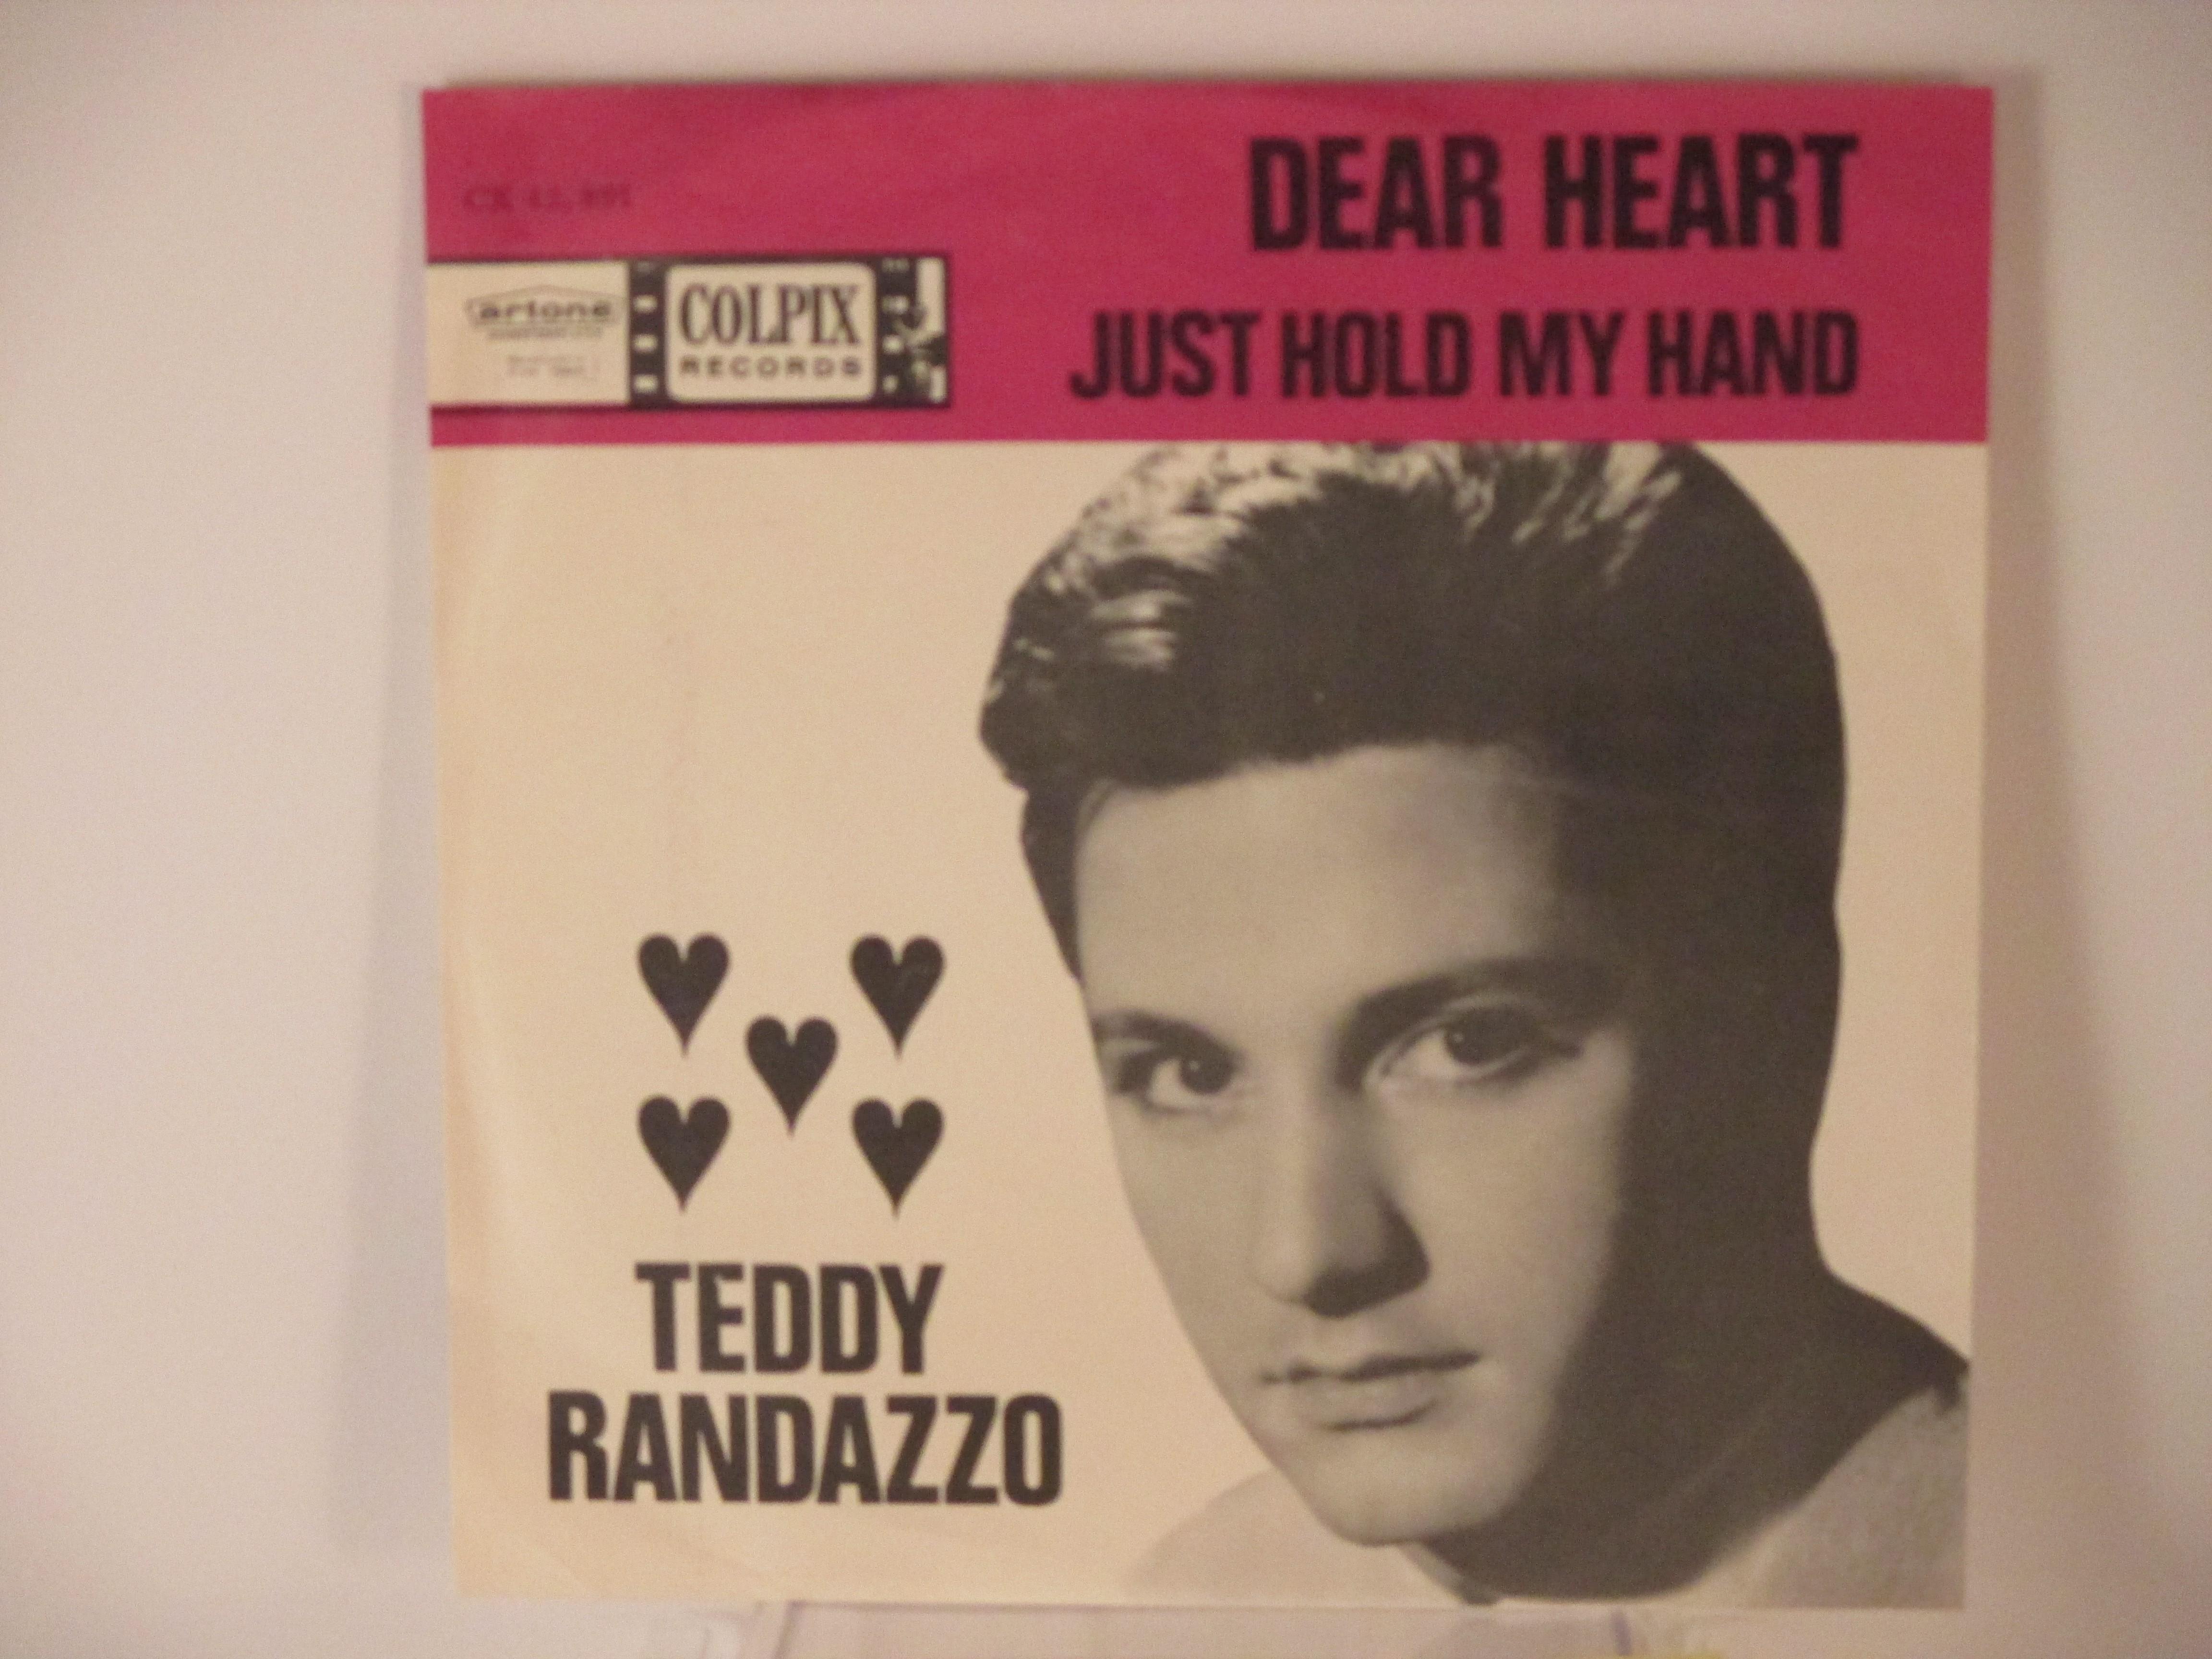 TEDDY RANDAZZO : Dear heart / Just hold my hand